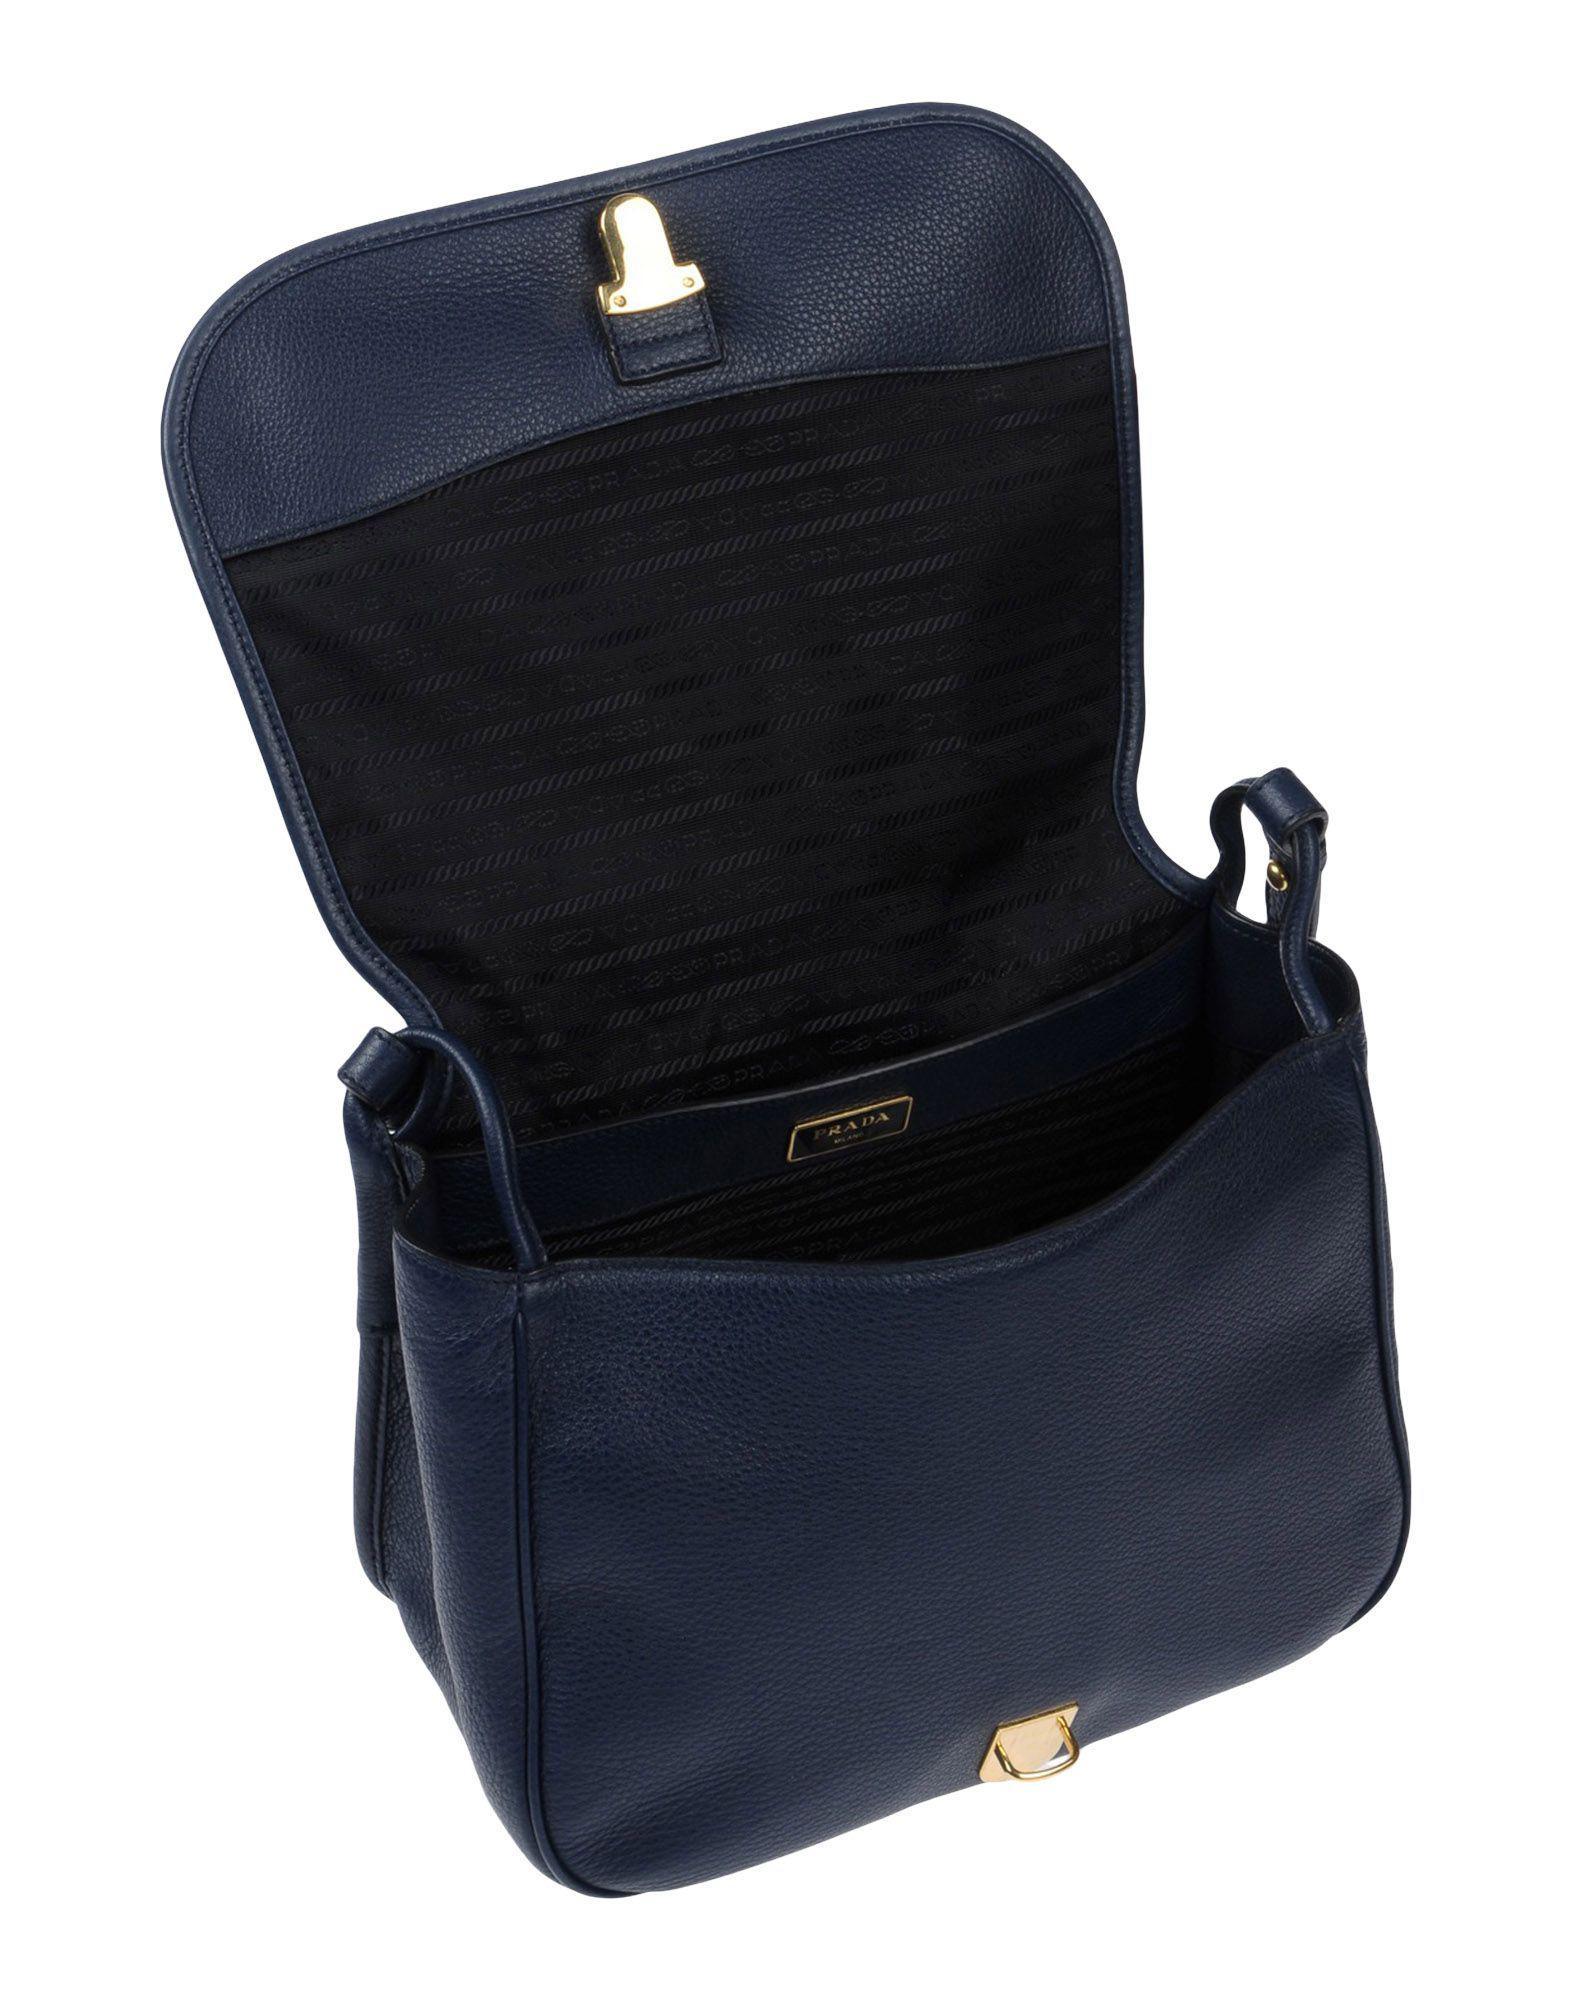 Prada Leather Cross-body Bag in Dark Blue (Blue)